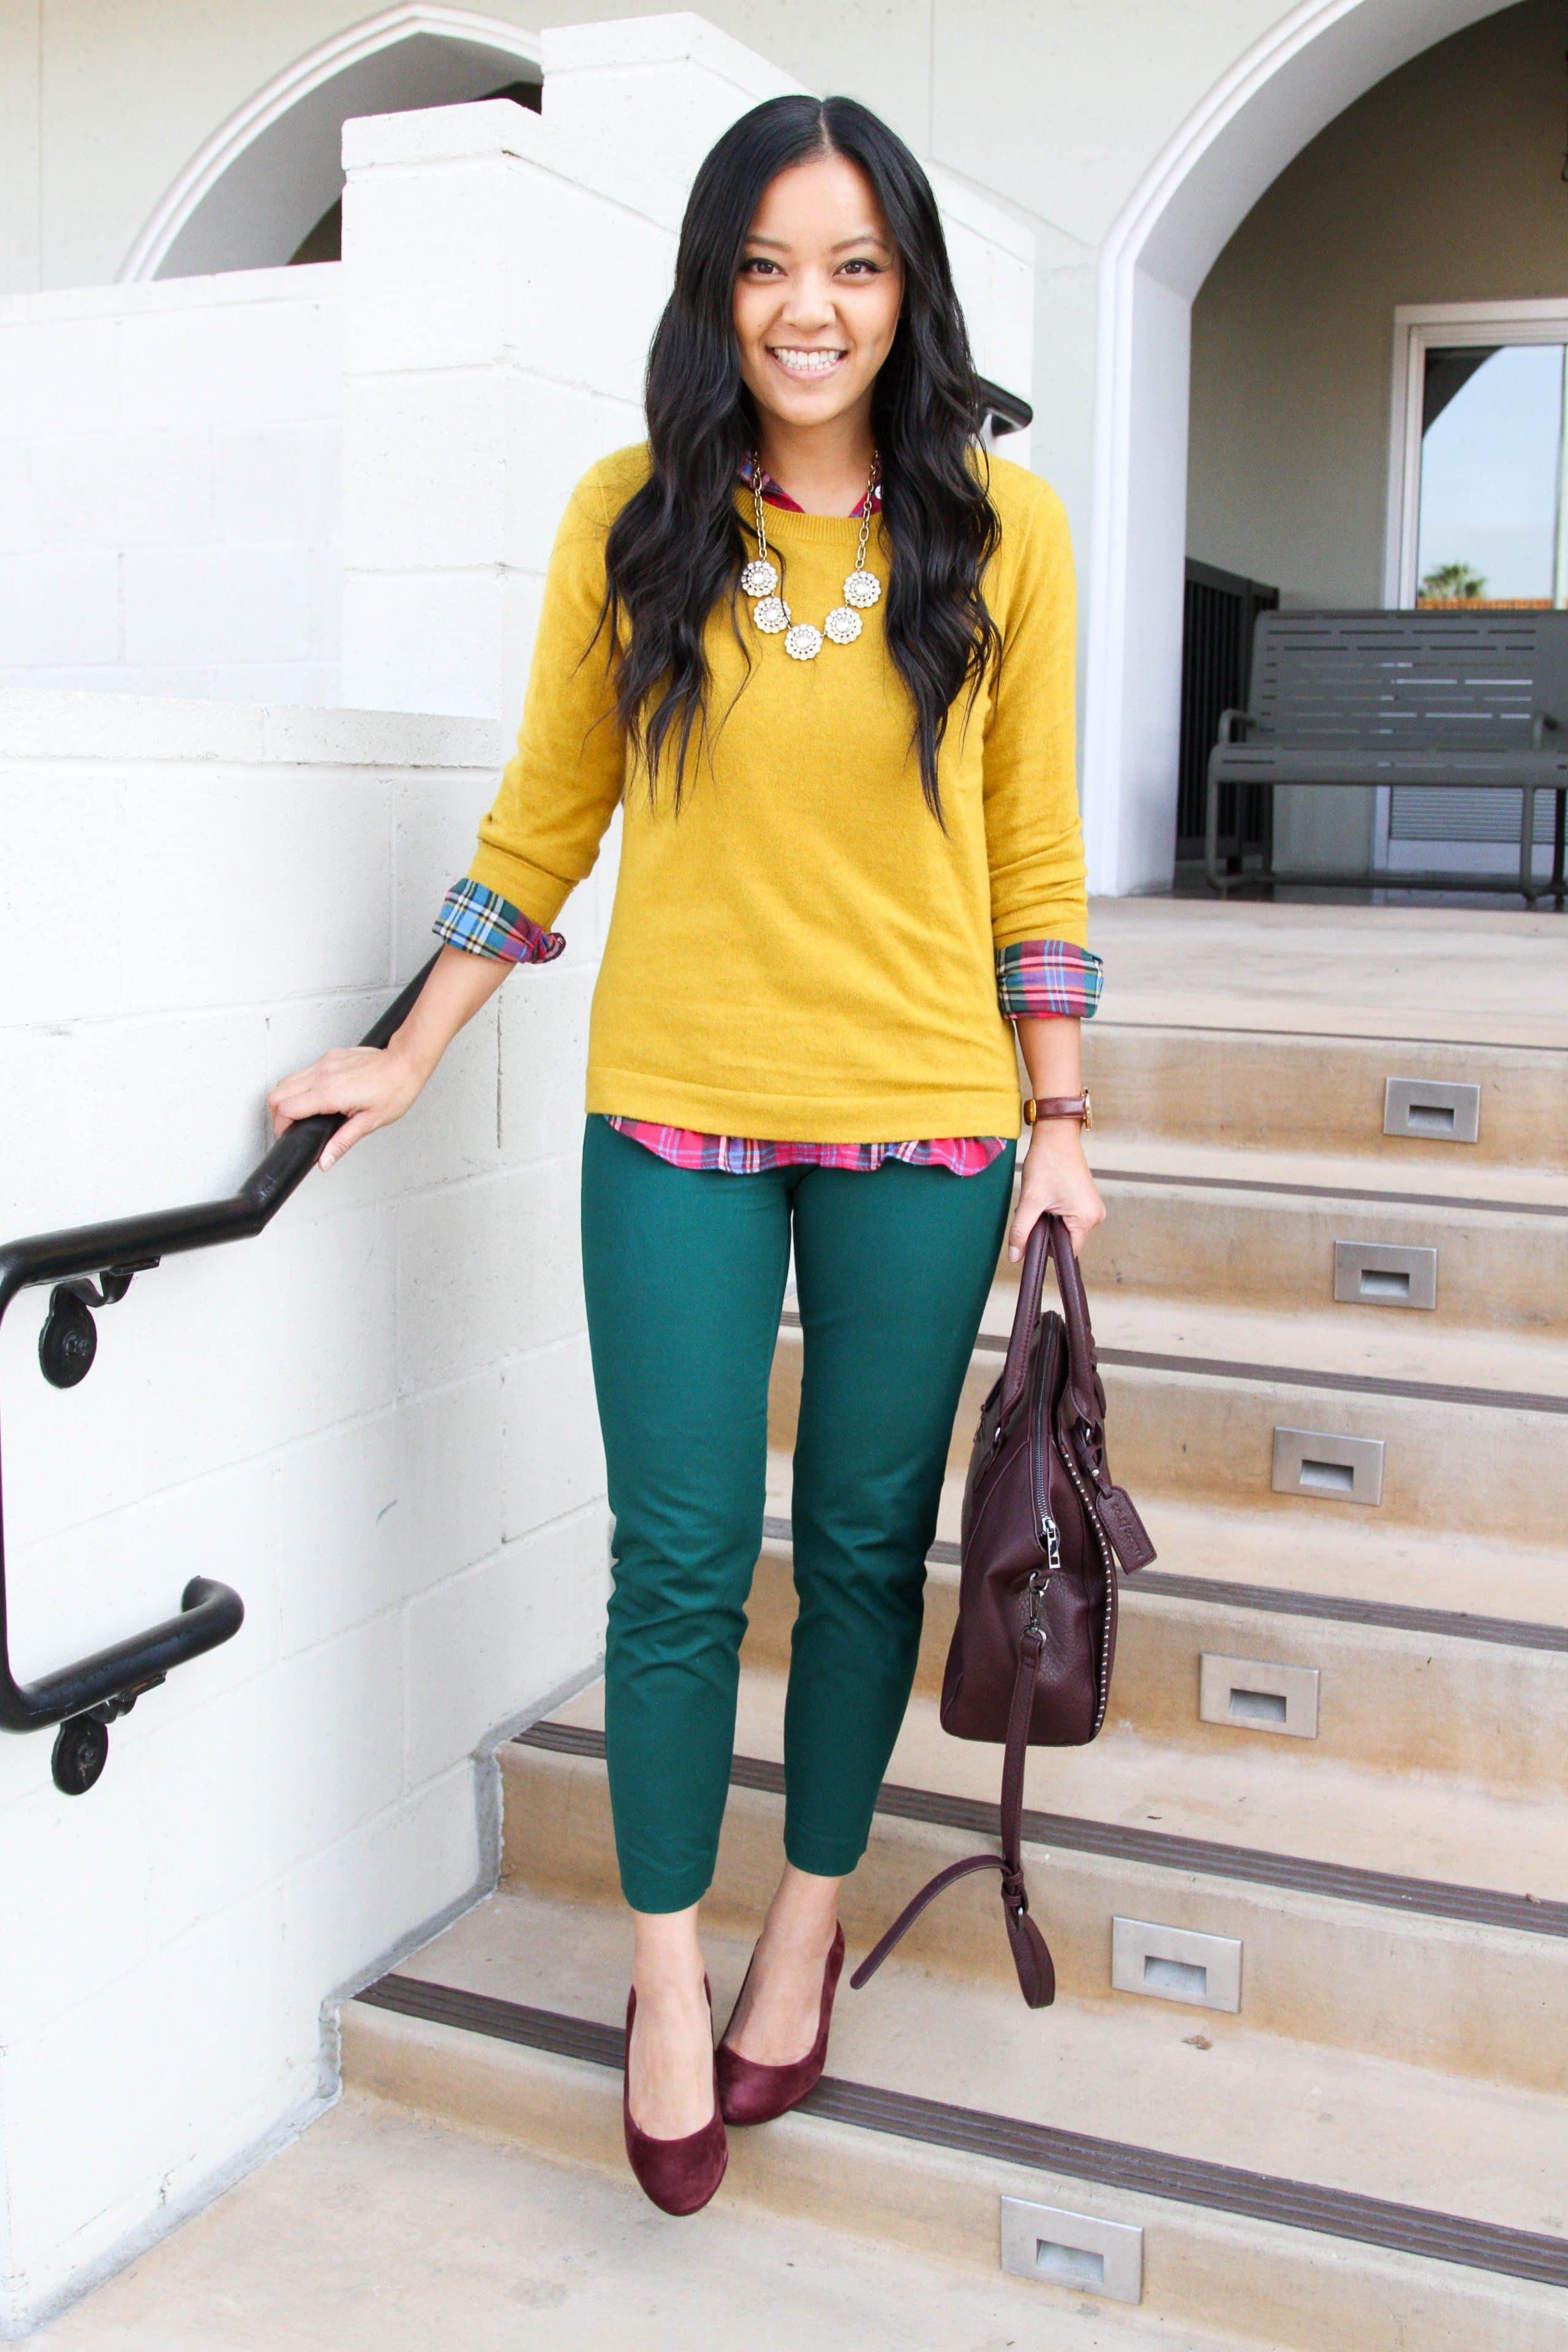 mustard yellow sweater + green slacks + checkered shirt + maroon pumps + maroon purse + business casual